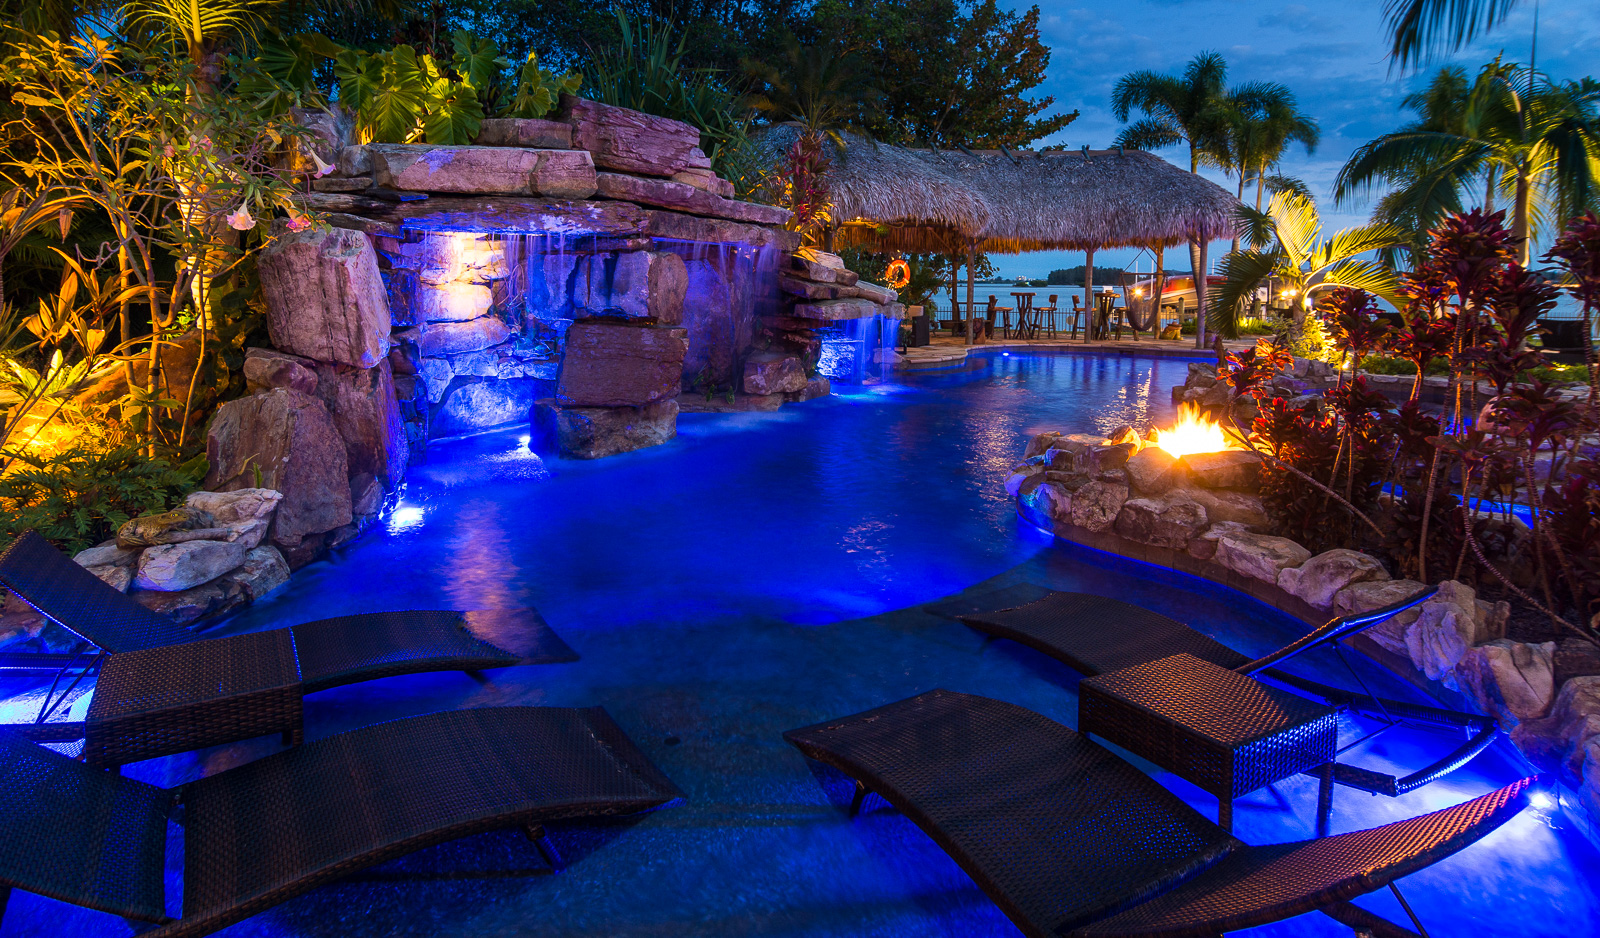 Design Waterfall Pools custom rock waterfall pool grotto spa natural stream tiki hut siesta key pools sun